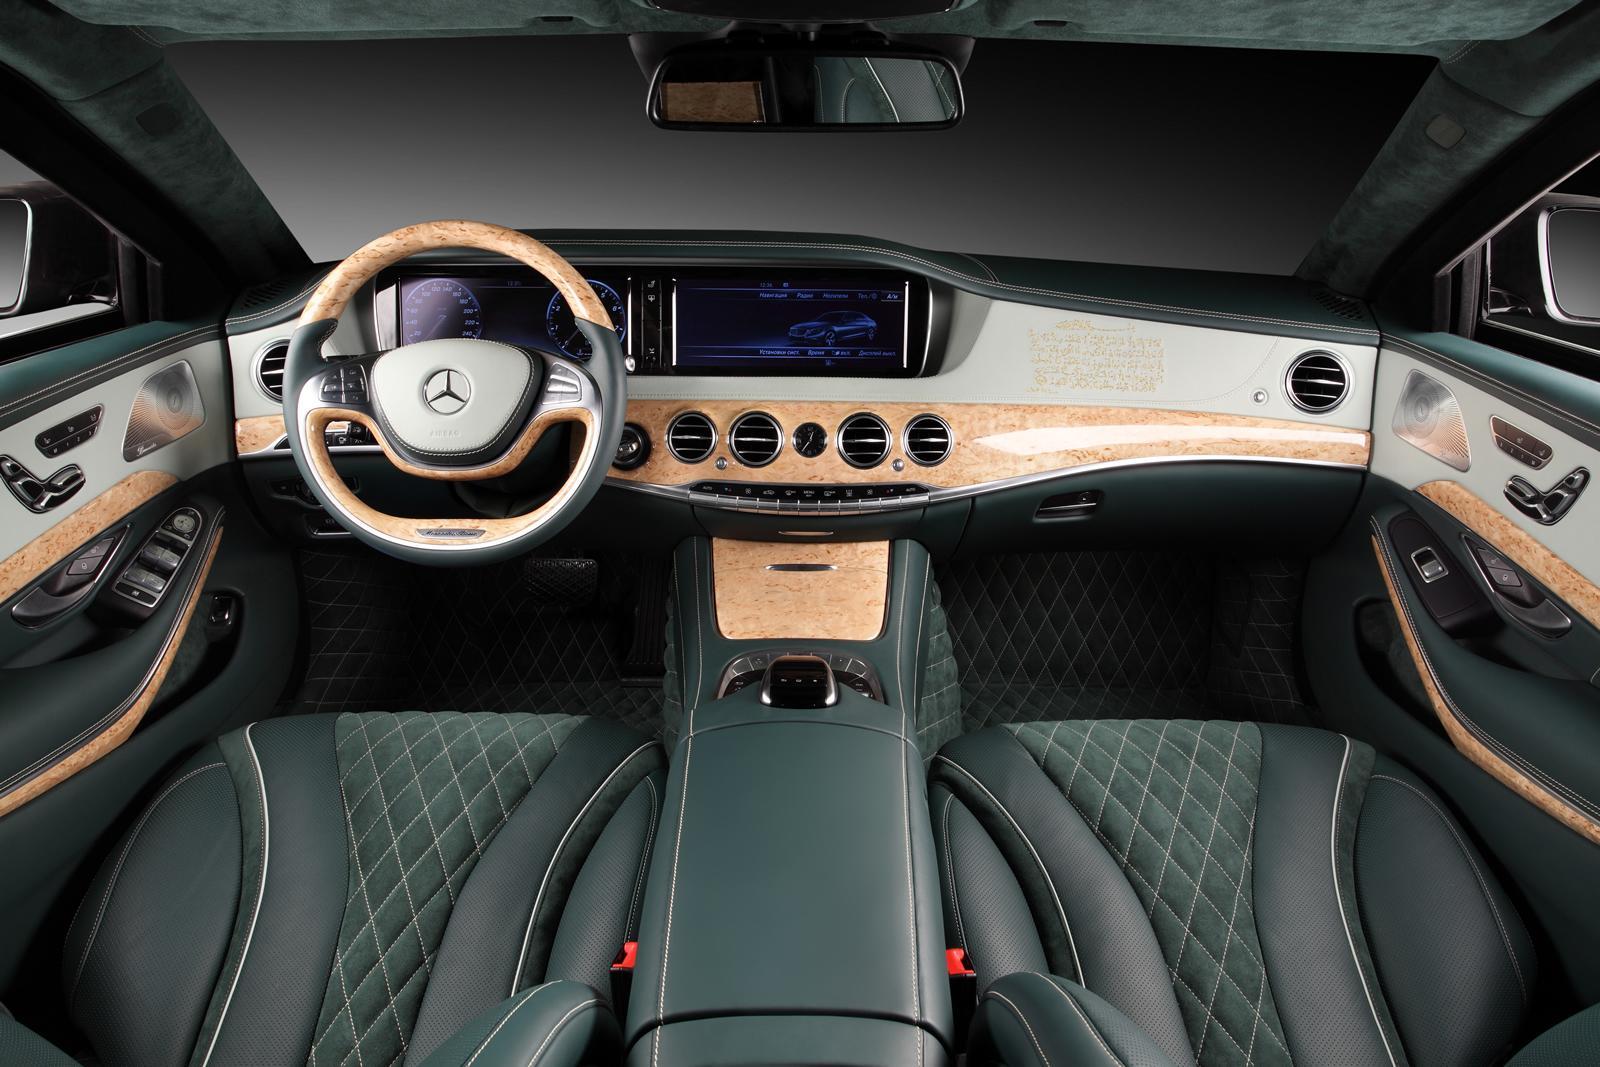 2016 BRABUS 900 Mercedes-Maybach S600 - Interior   HD Wallpaper #6